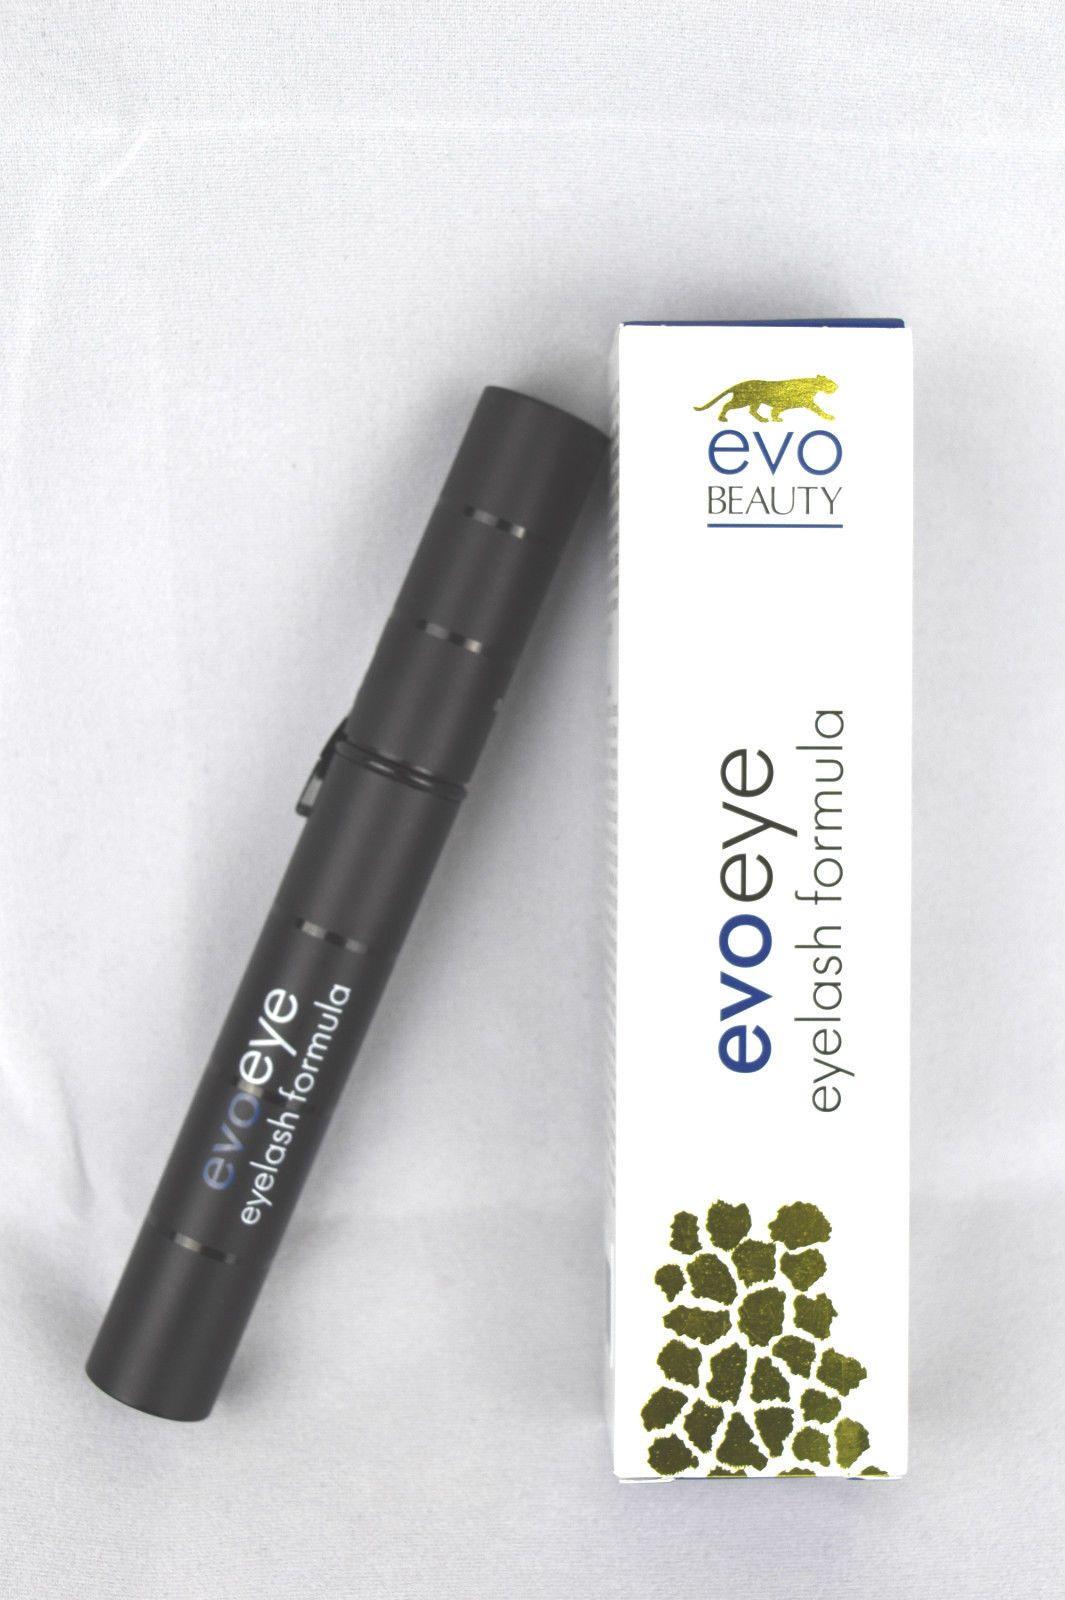 Evo Beaute Evoeye Eyelash Formulaeyelash Extension Serum Made In